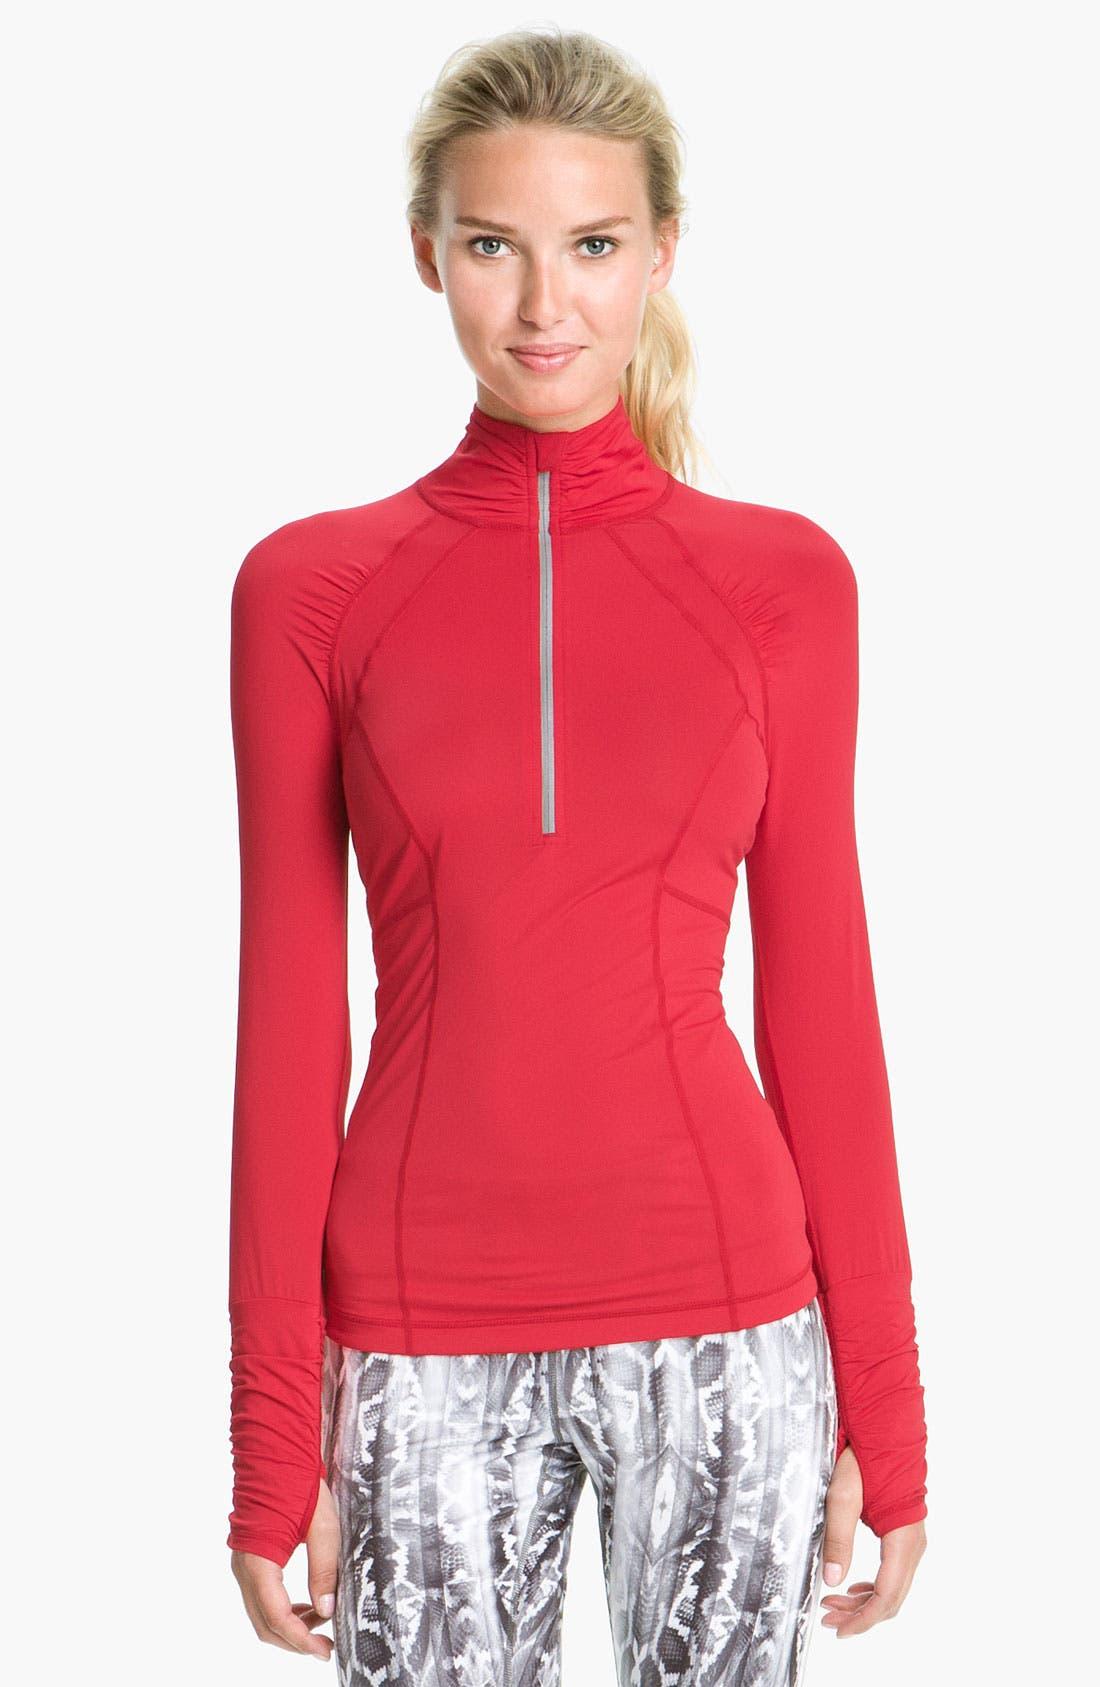 Alternate Image 1 Selected - Zella 'Micro Jersey' Half Zip Pullover